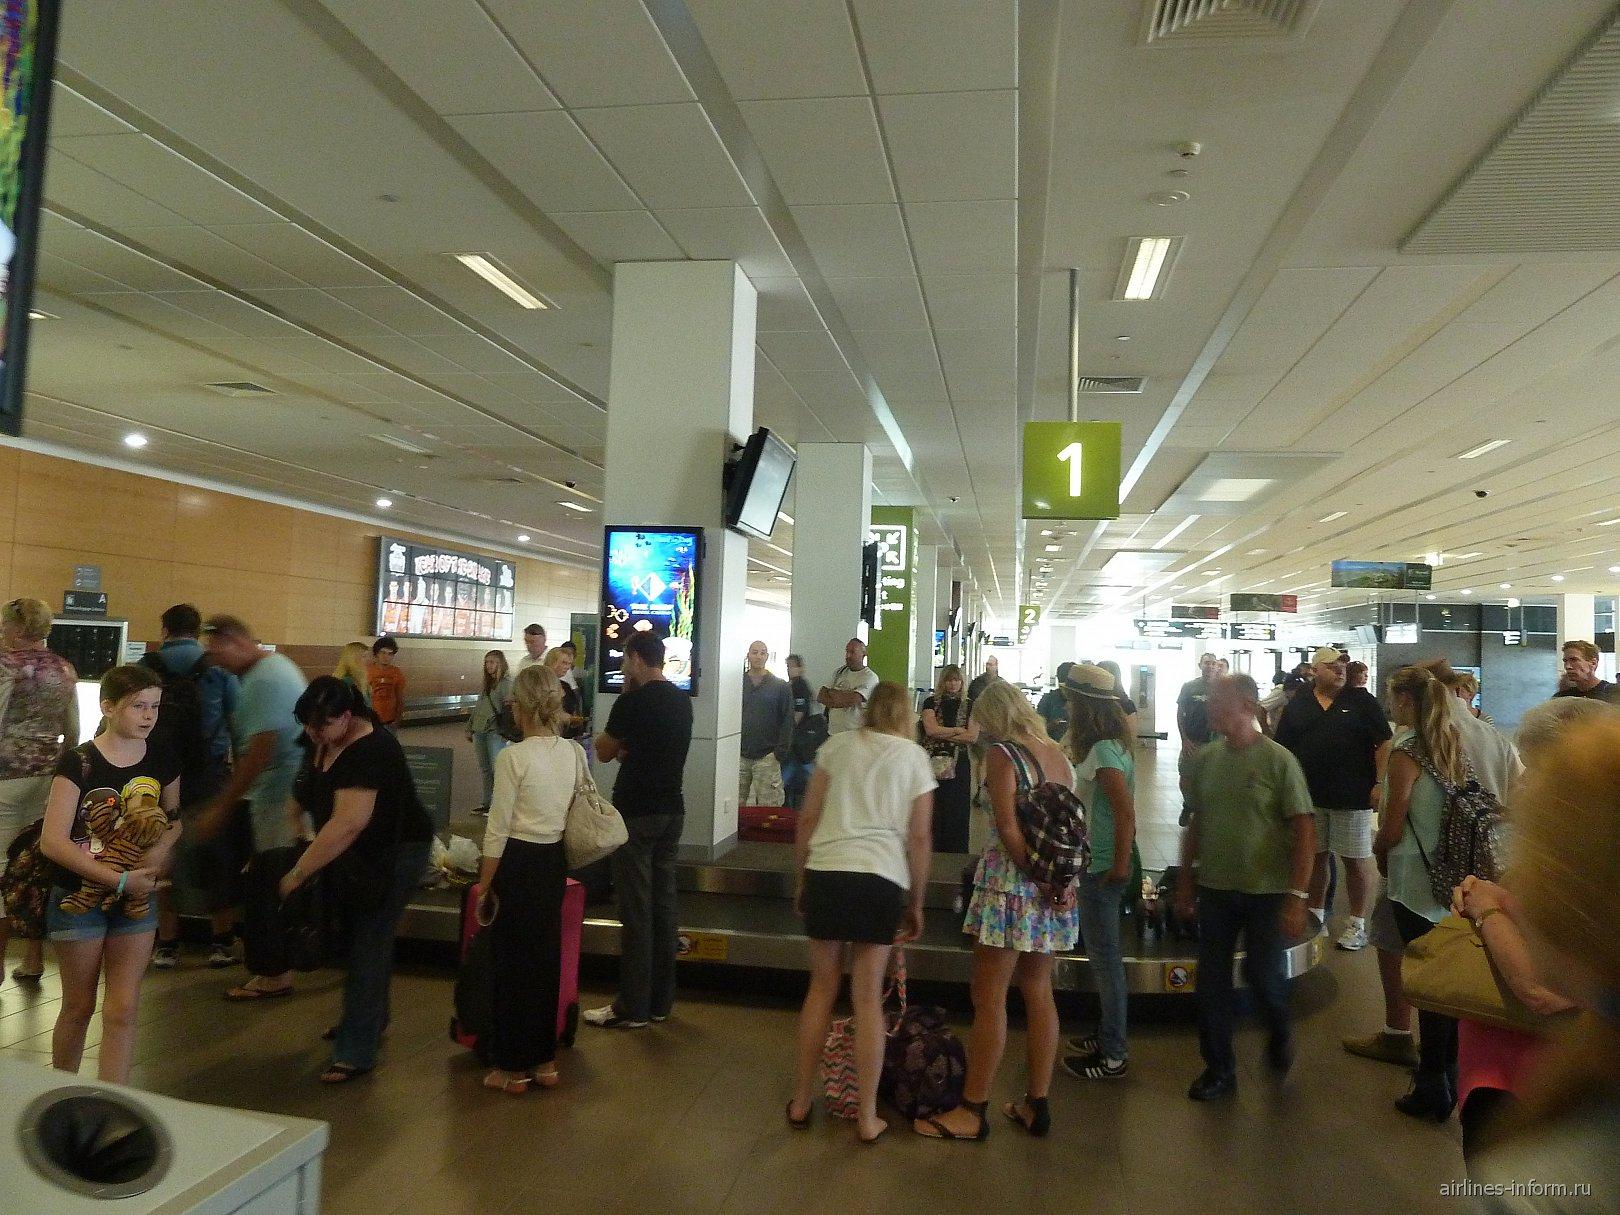 В аэропорту Кэрнс